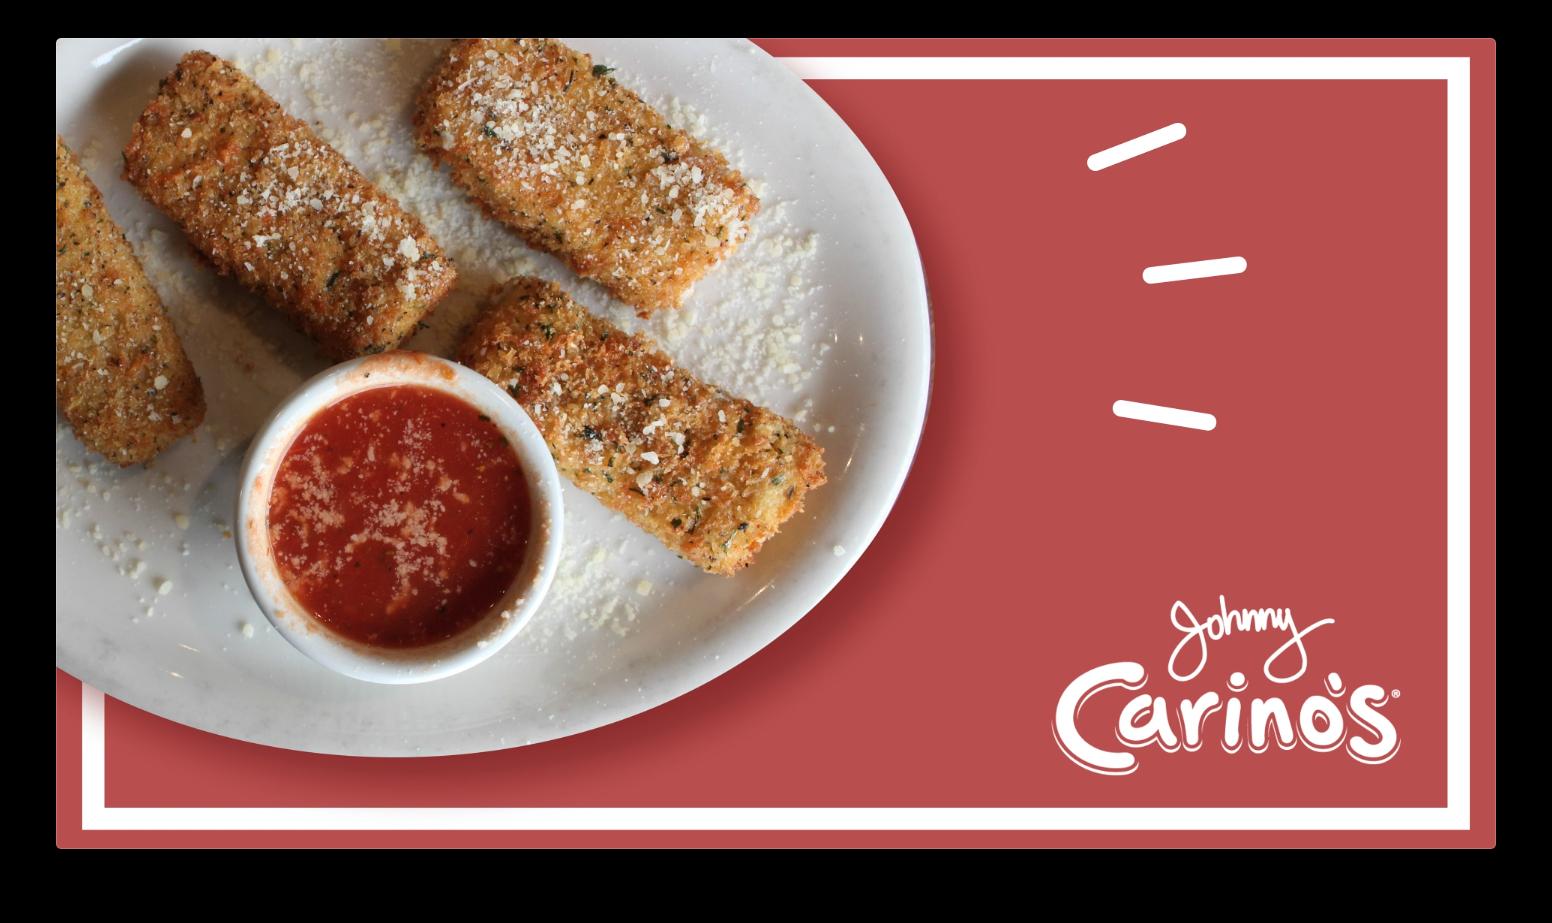 johnny carino's mozzarella sticks motion graphic screenshot